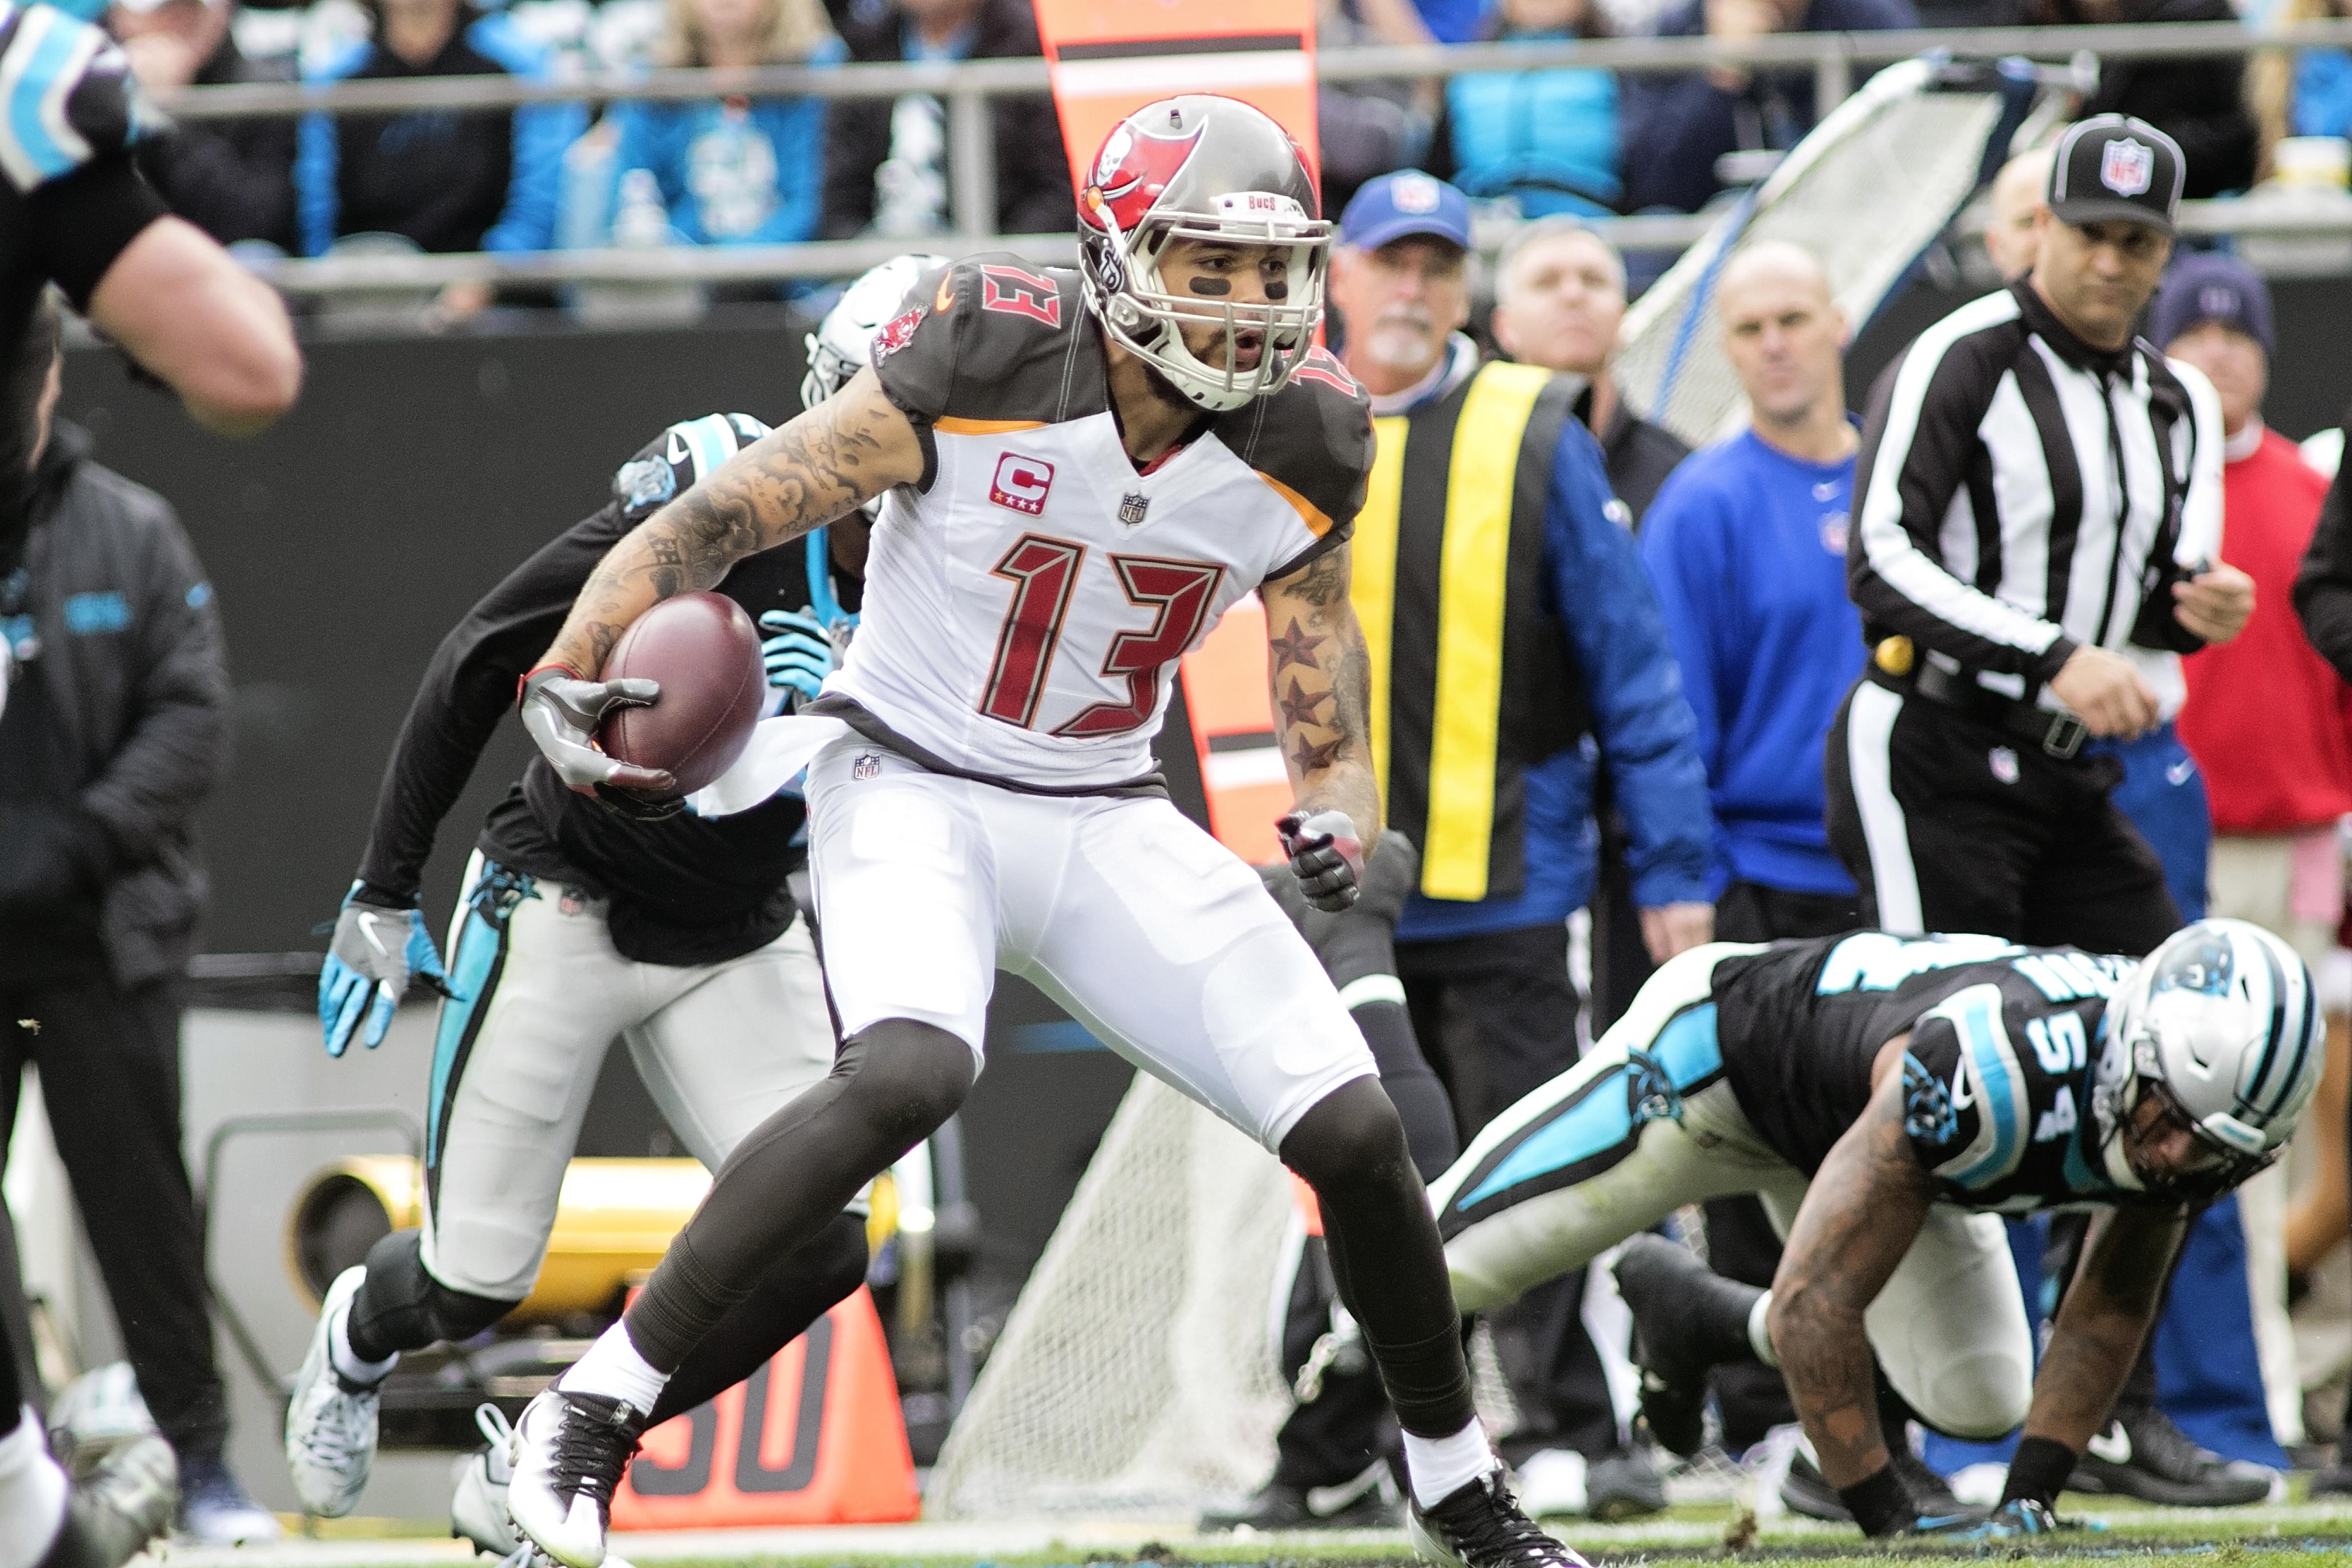 Evans caught six for 107 yards on Sunday./CARMEN MANDATO